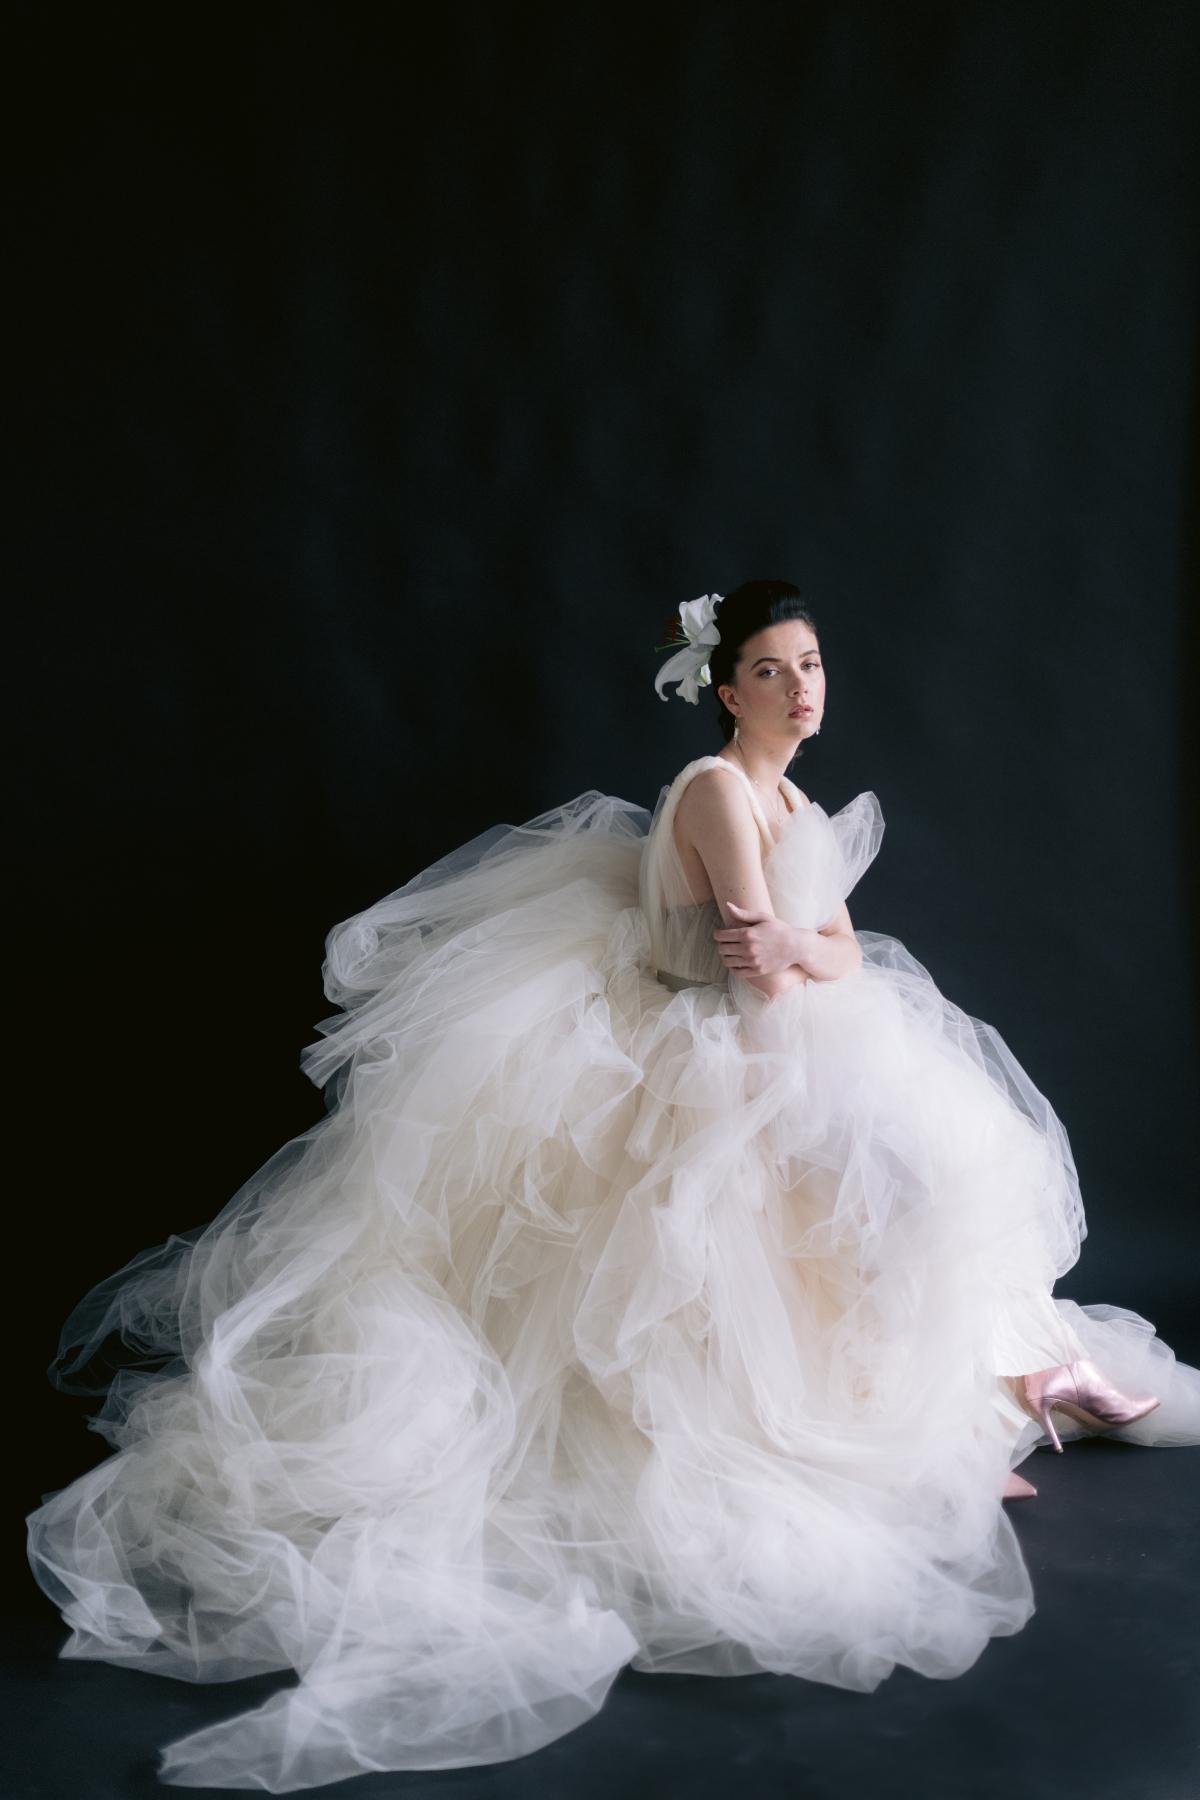 Laura Lanzerotte Bridal Danielle Heinson Photography 91